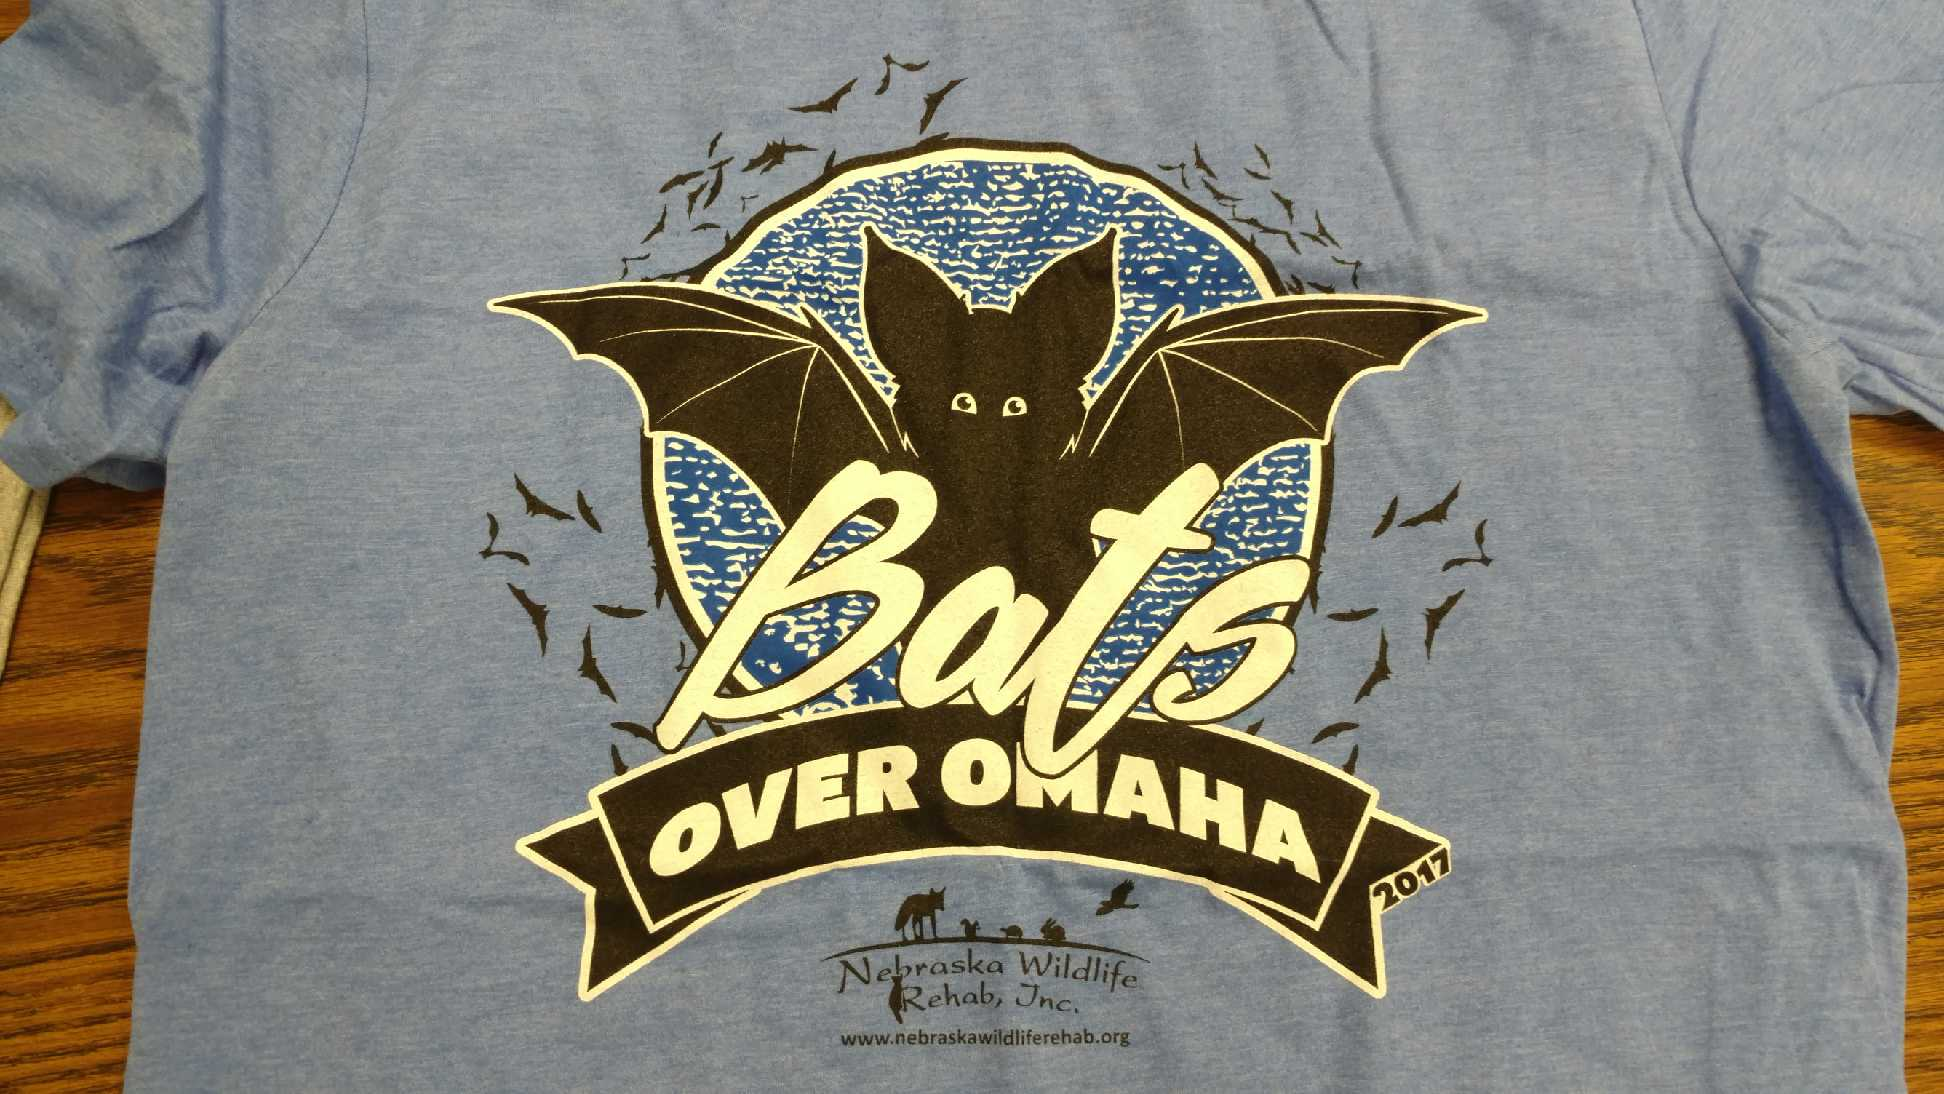 Bats Over Omaha Bat Release T-Shirt - 2017: Adult Small, Heather Blue